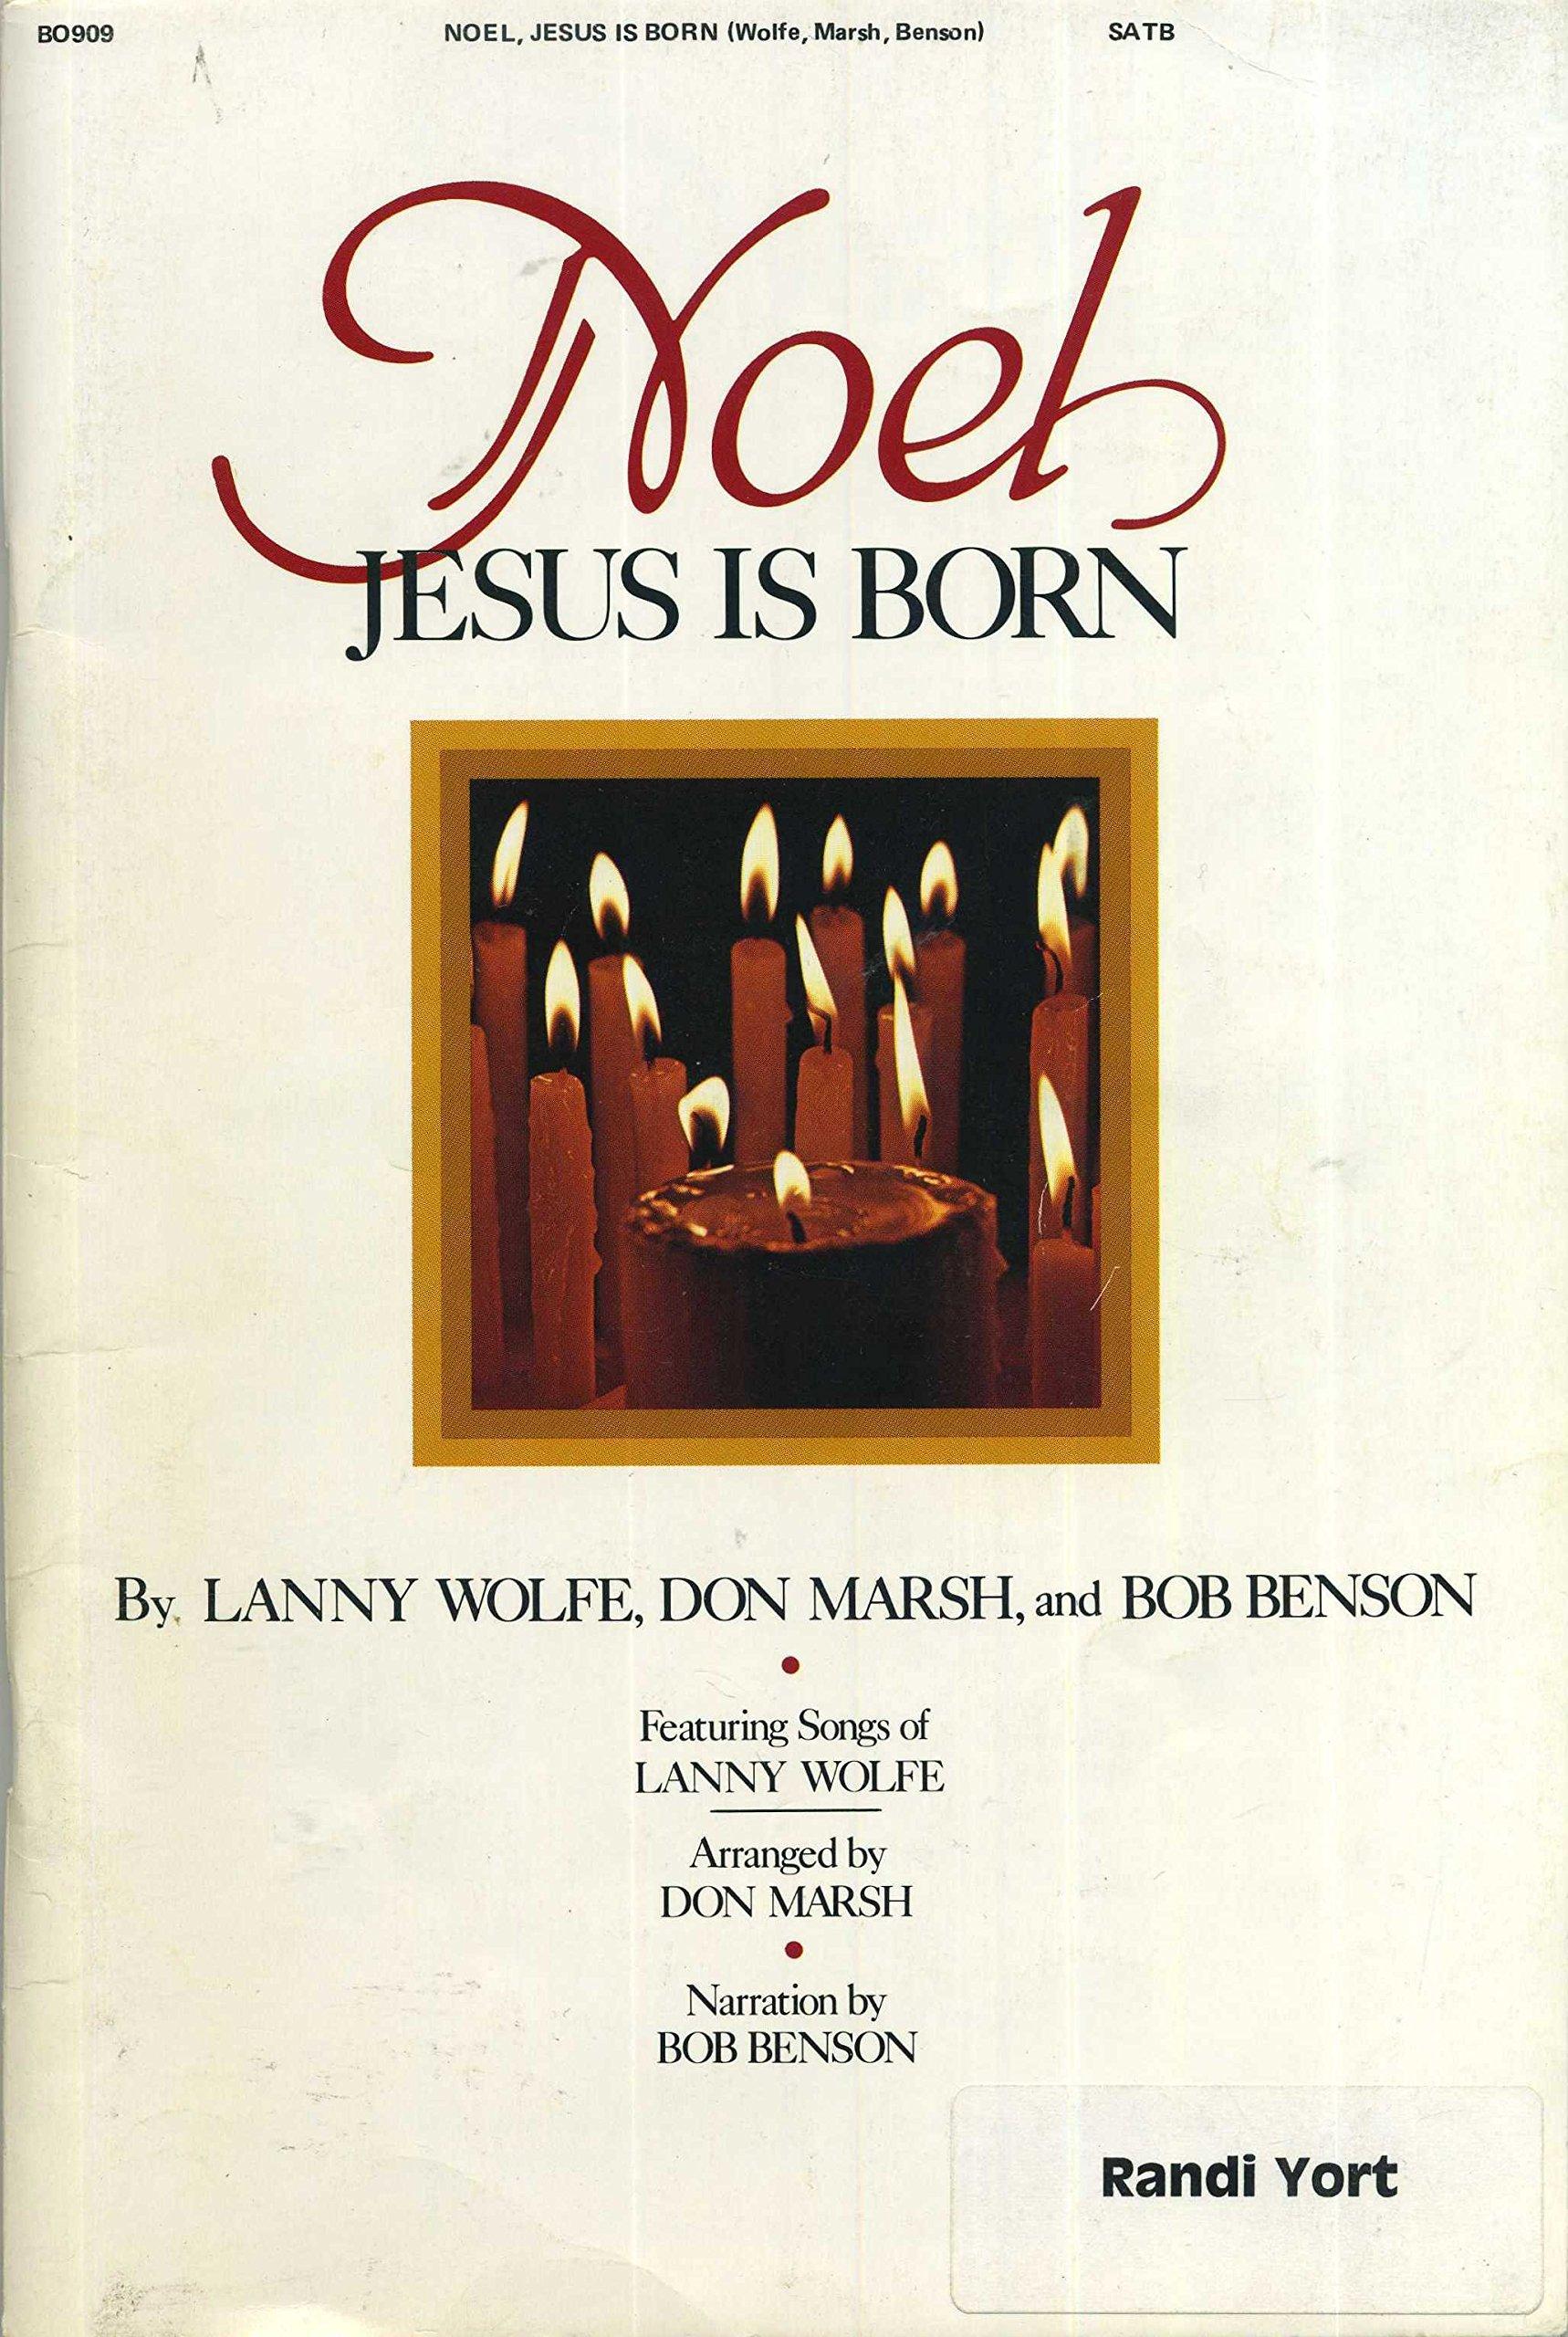 Image De Noel Jesus.Noel Jesus Is Born Don Marsh Bob Benson Lanny Wolfe